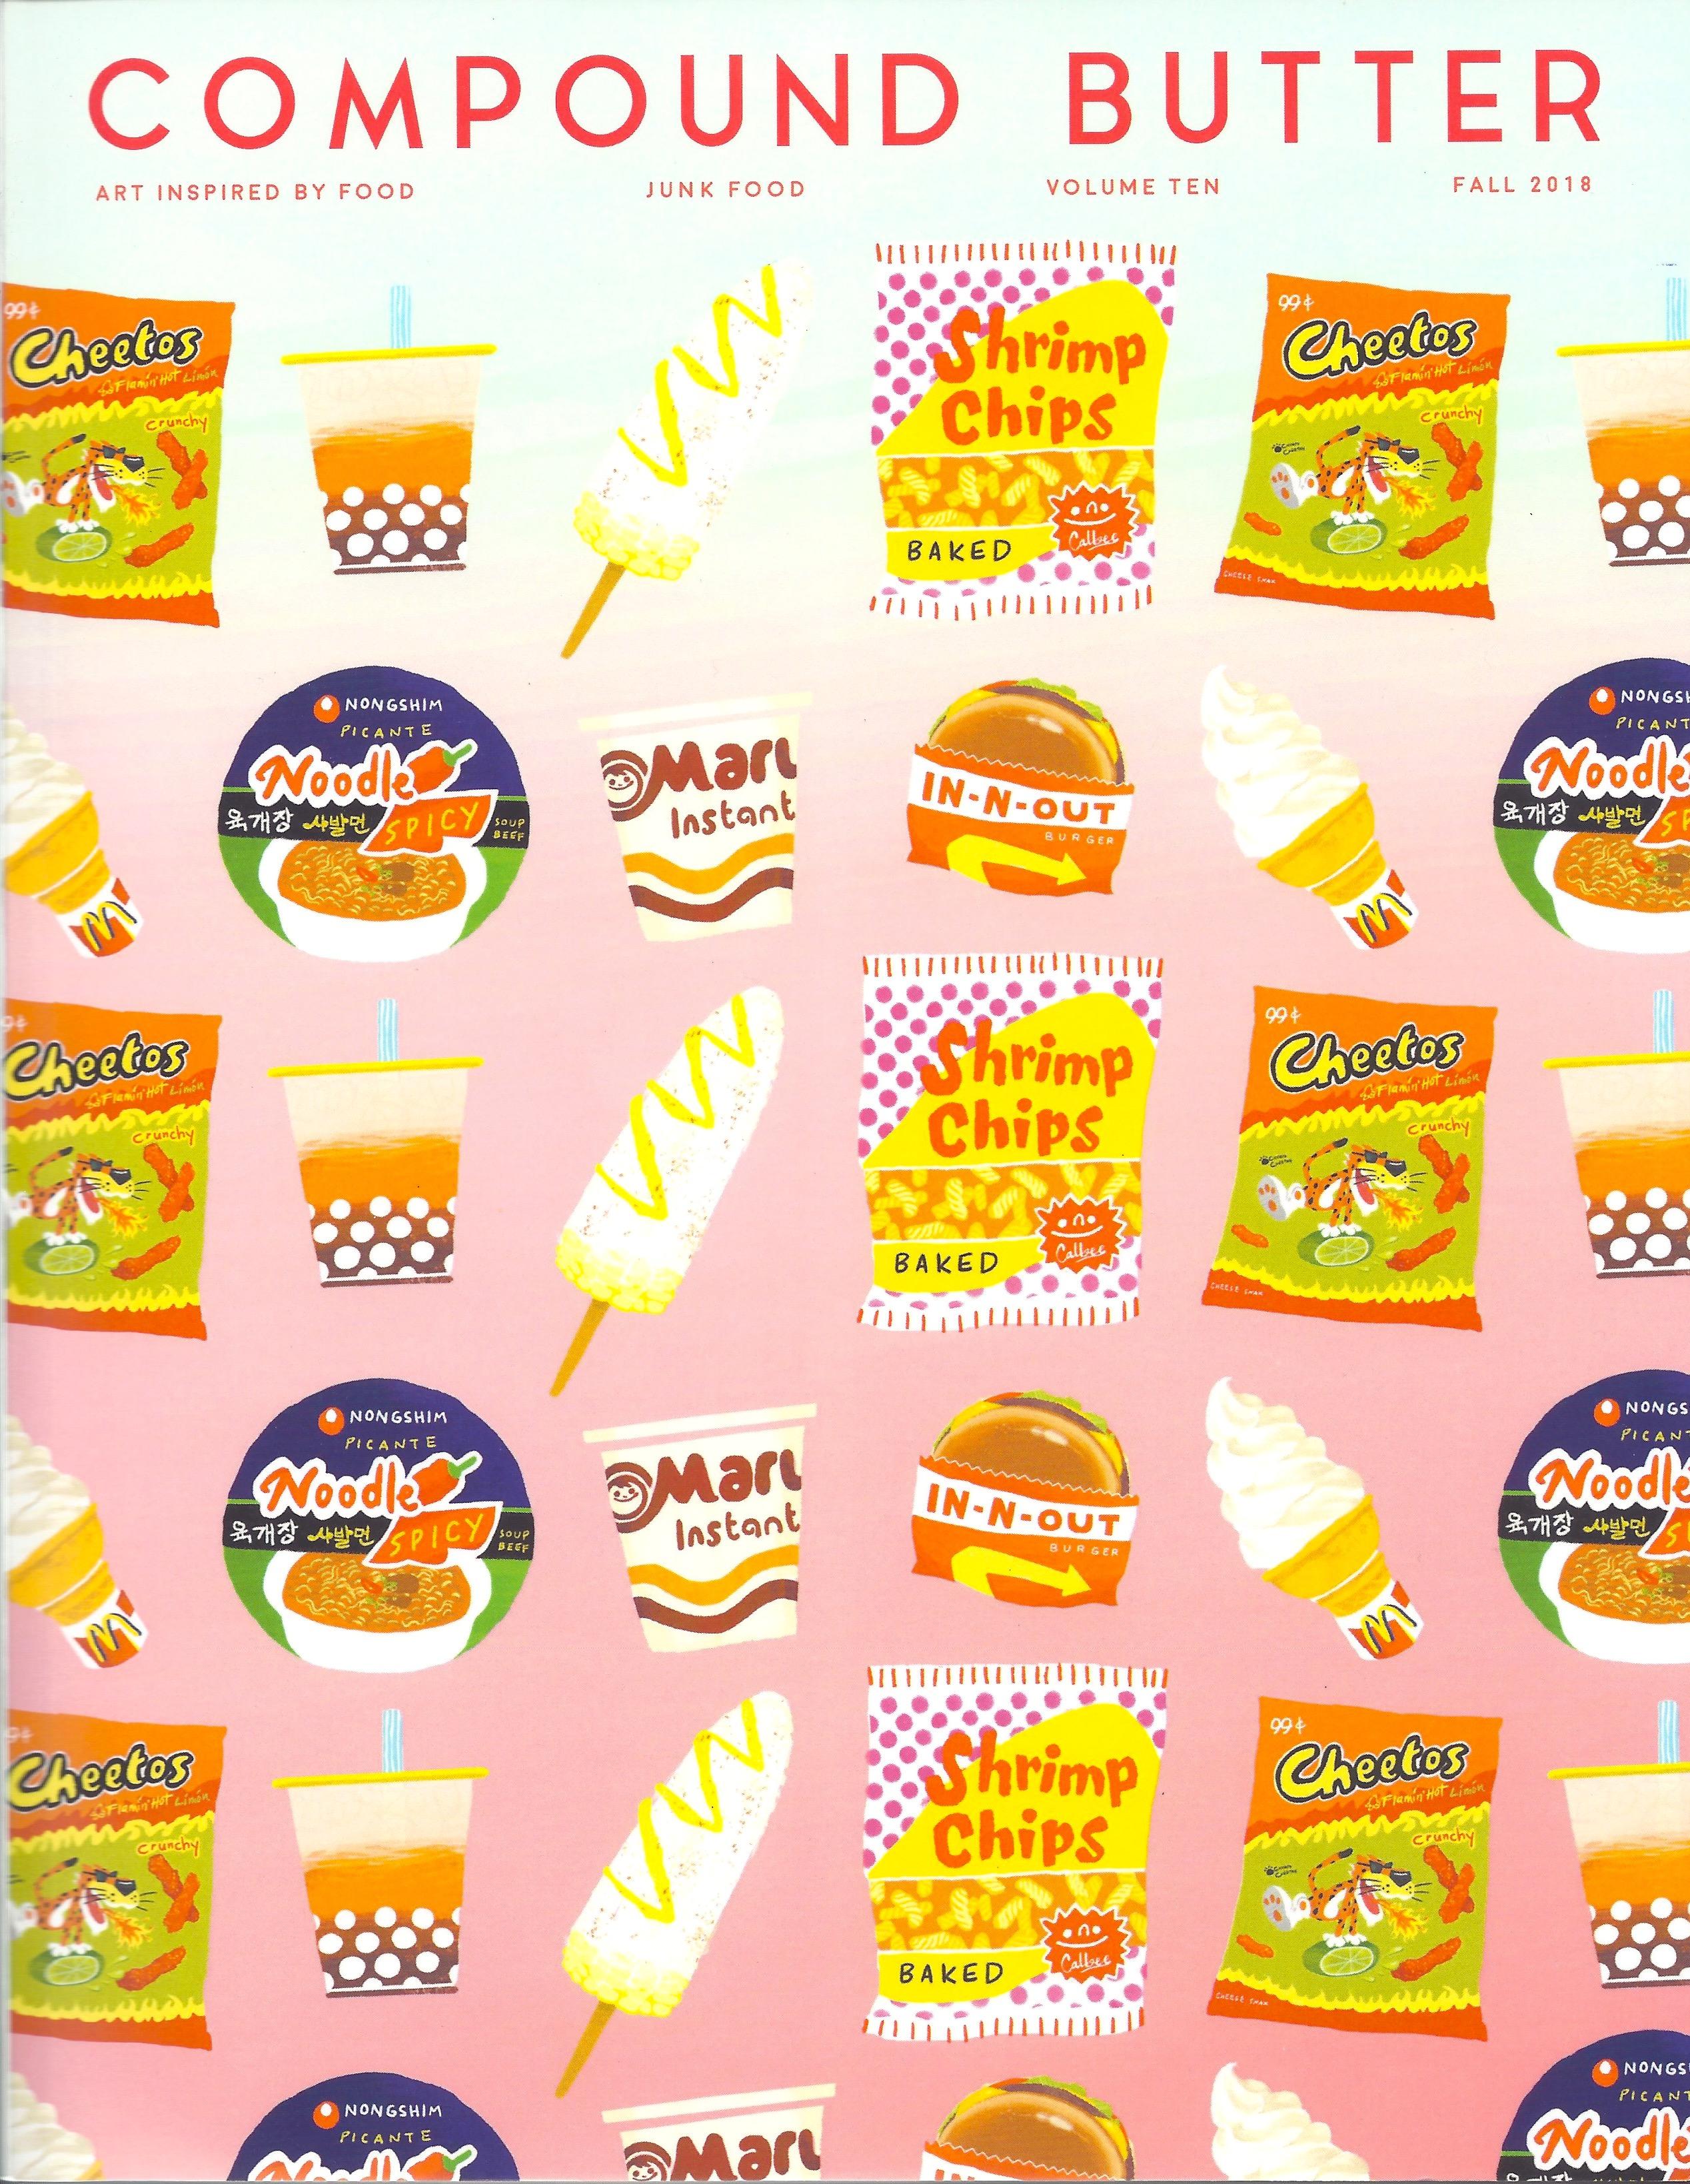 Compound Butter Volume Ten